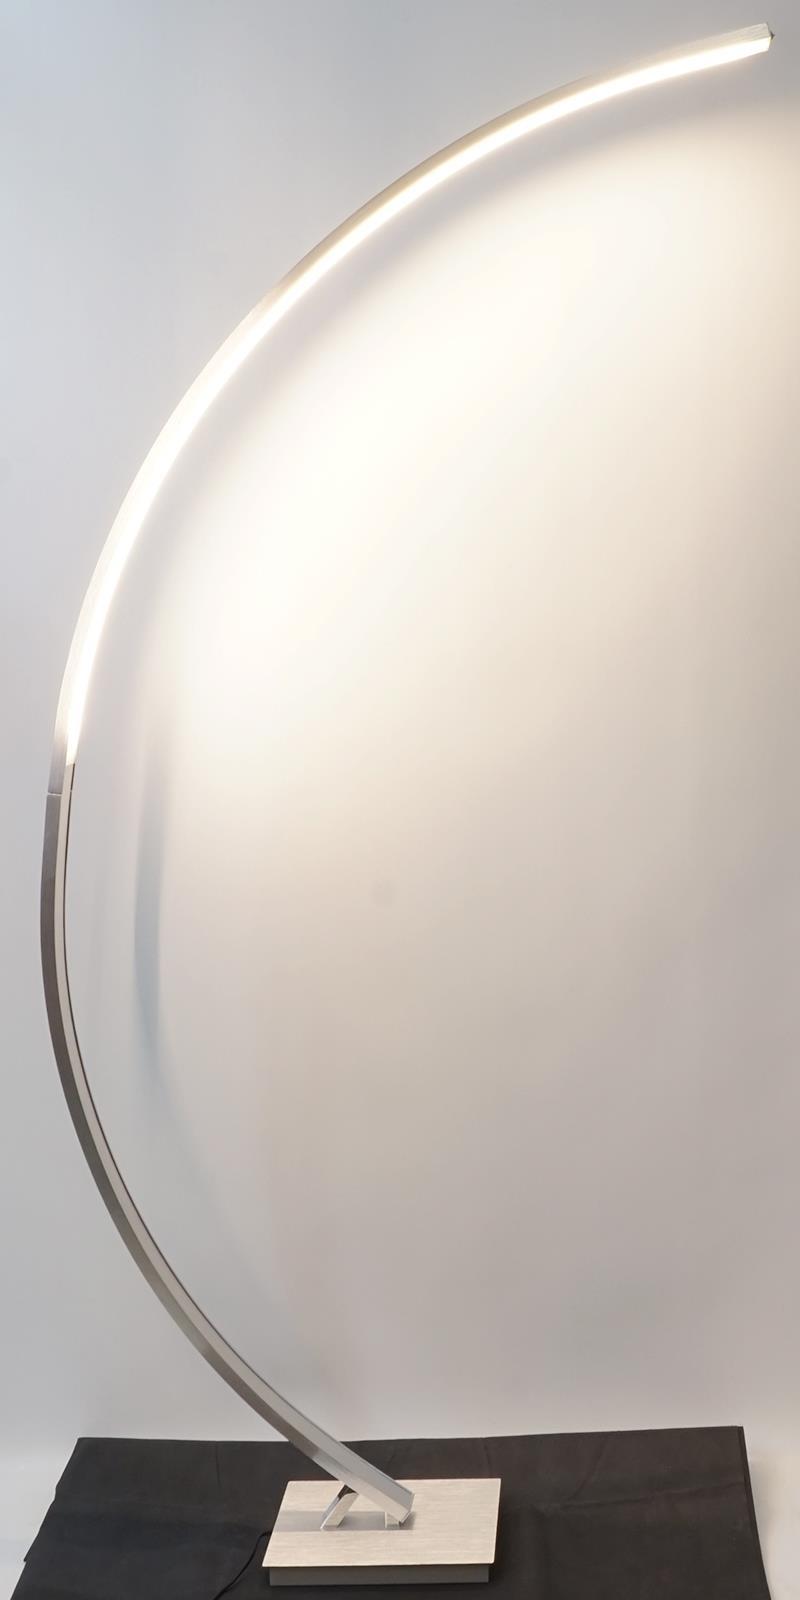 Bogenleuchte LED dimmbar EAN770 Livarno Lux Stehlampe Standleuchte *B-Ware